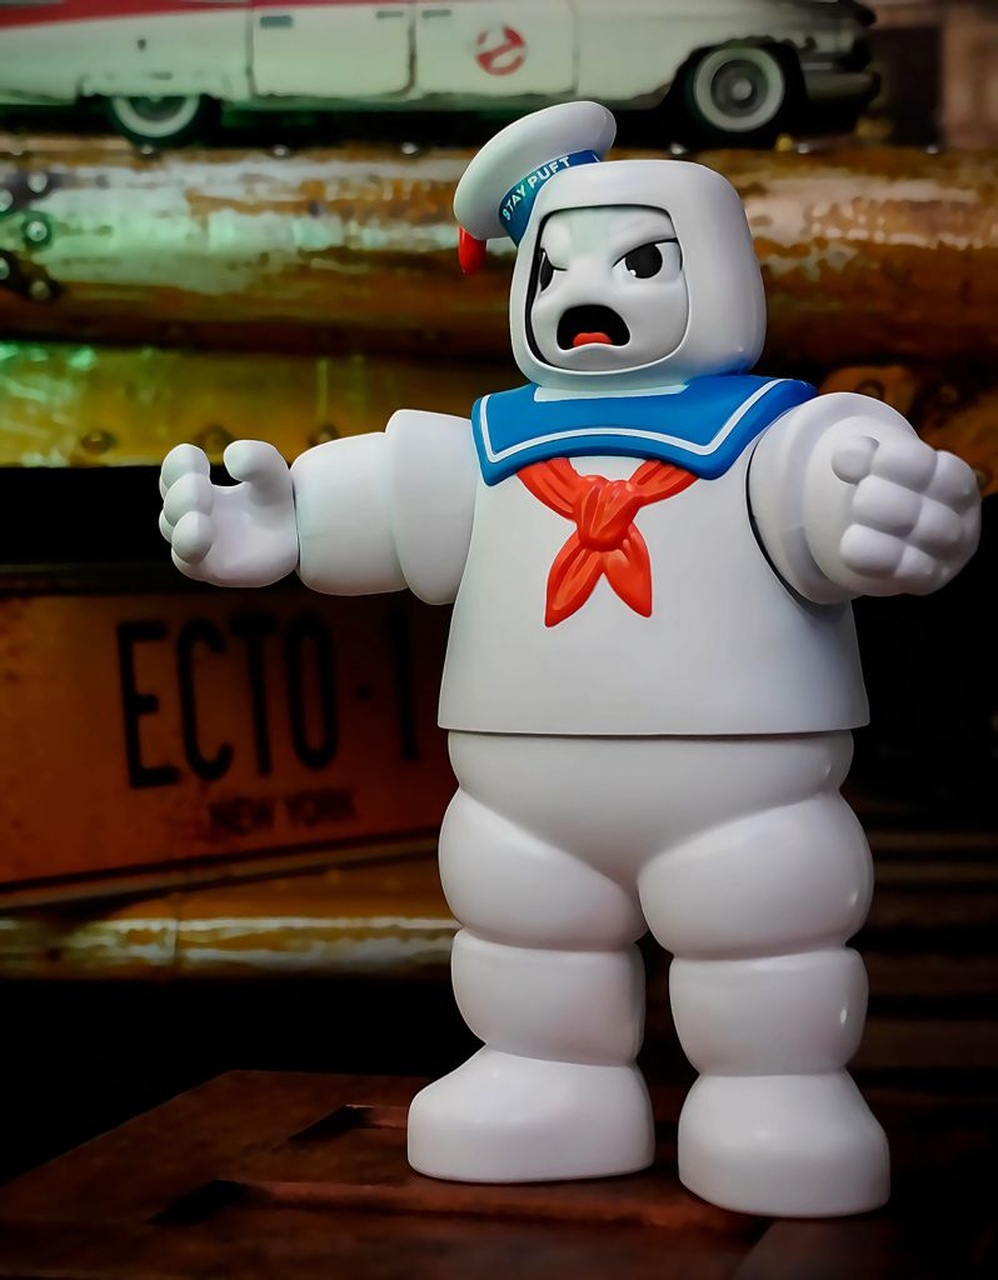 Boneco Action Figure Stay Puft Homem de Marshmallow Os Caça Fantasmas Ghostbusters E9609 - Hasbro